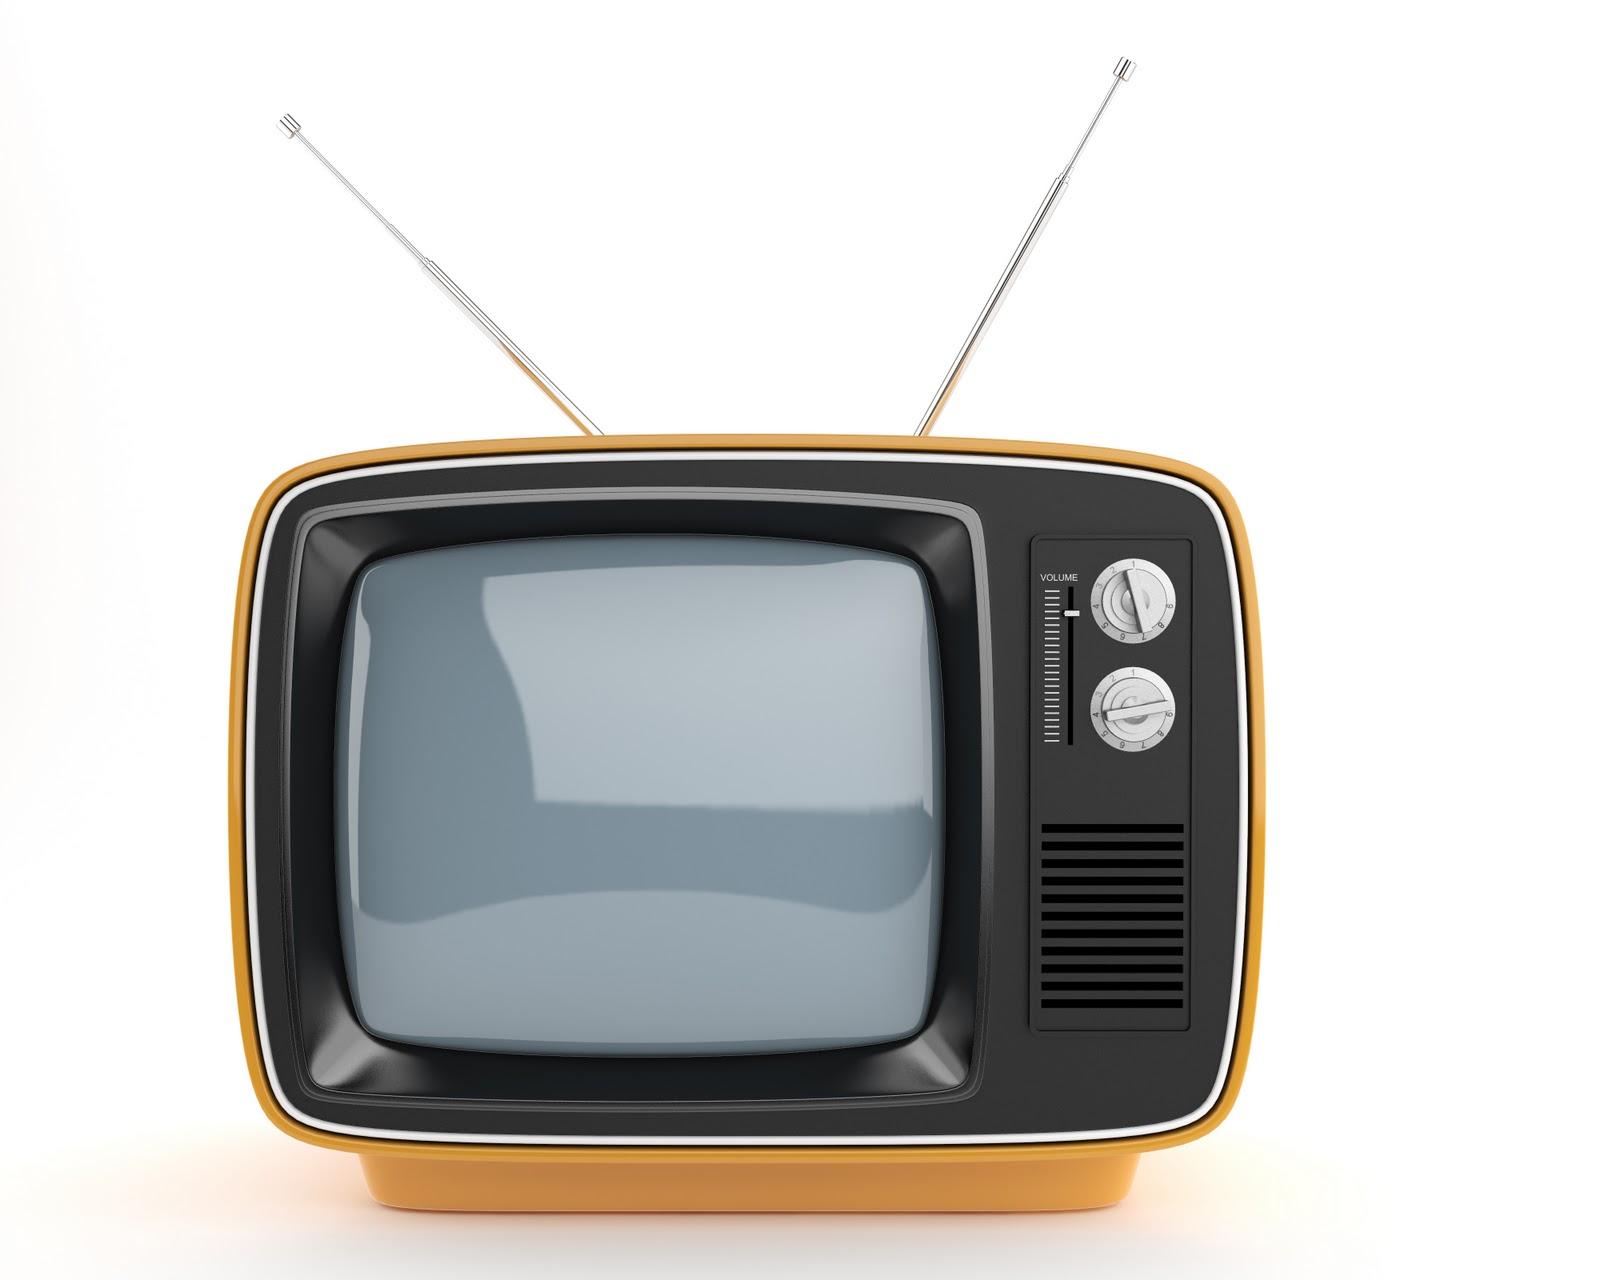 Tv shutterstock 23301313